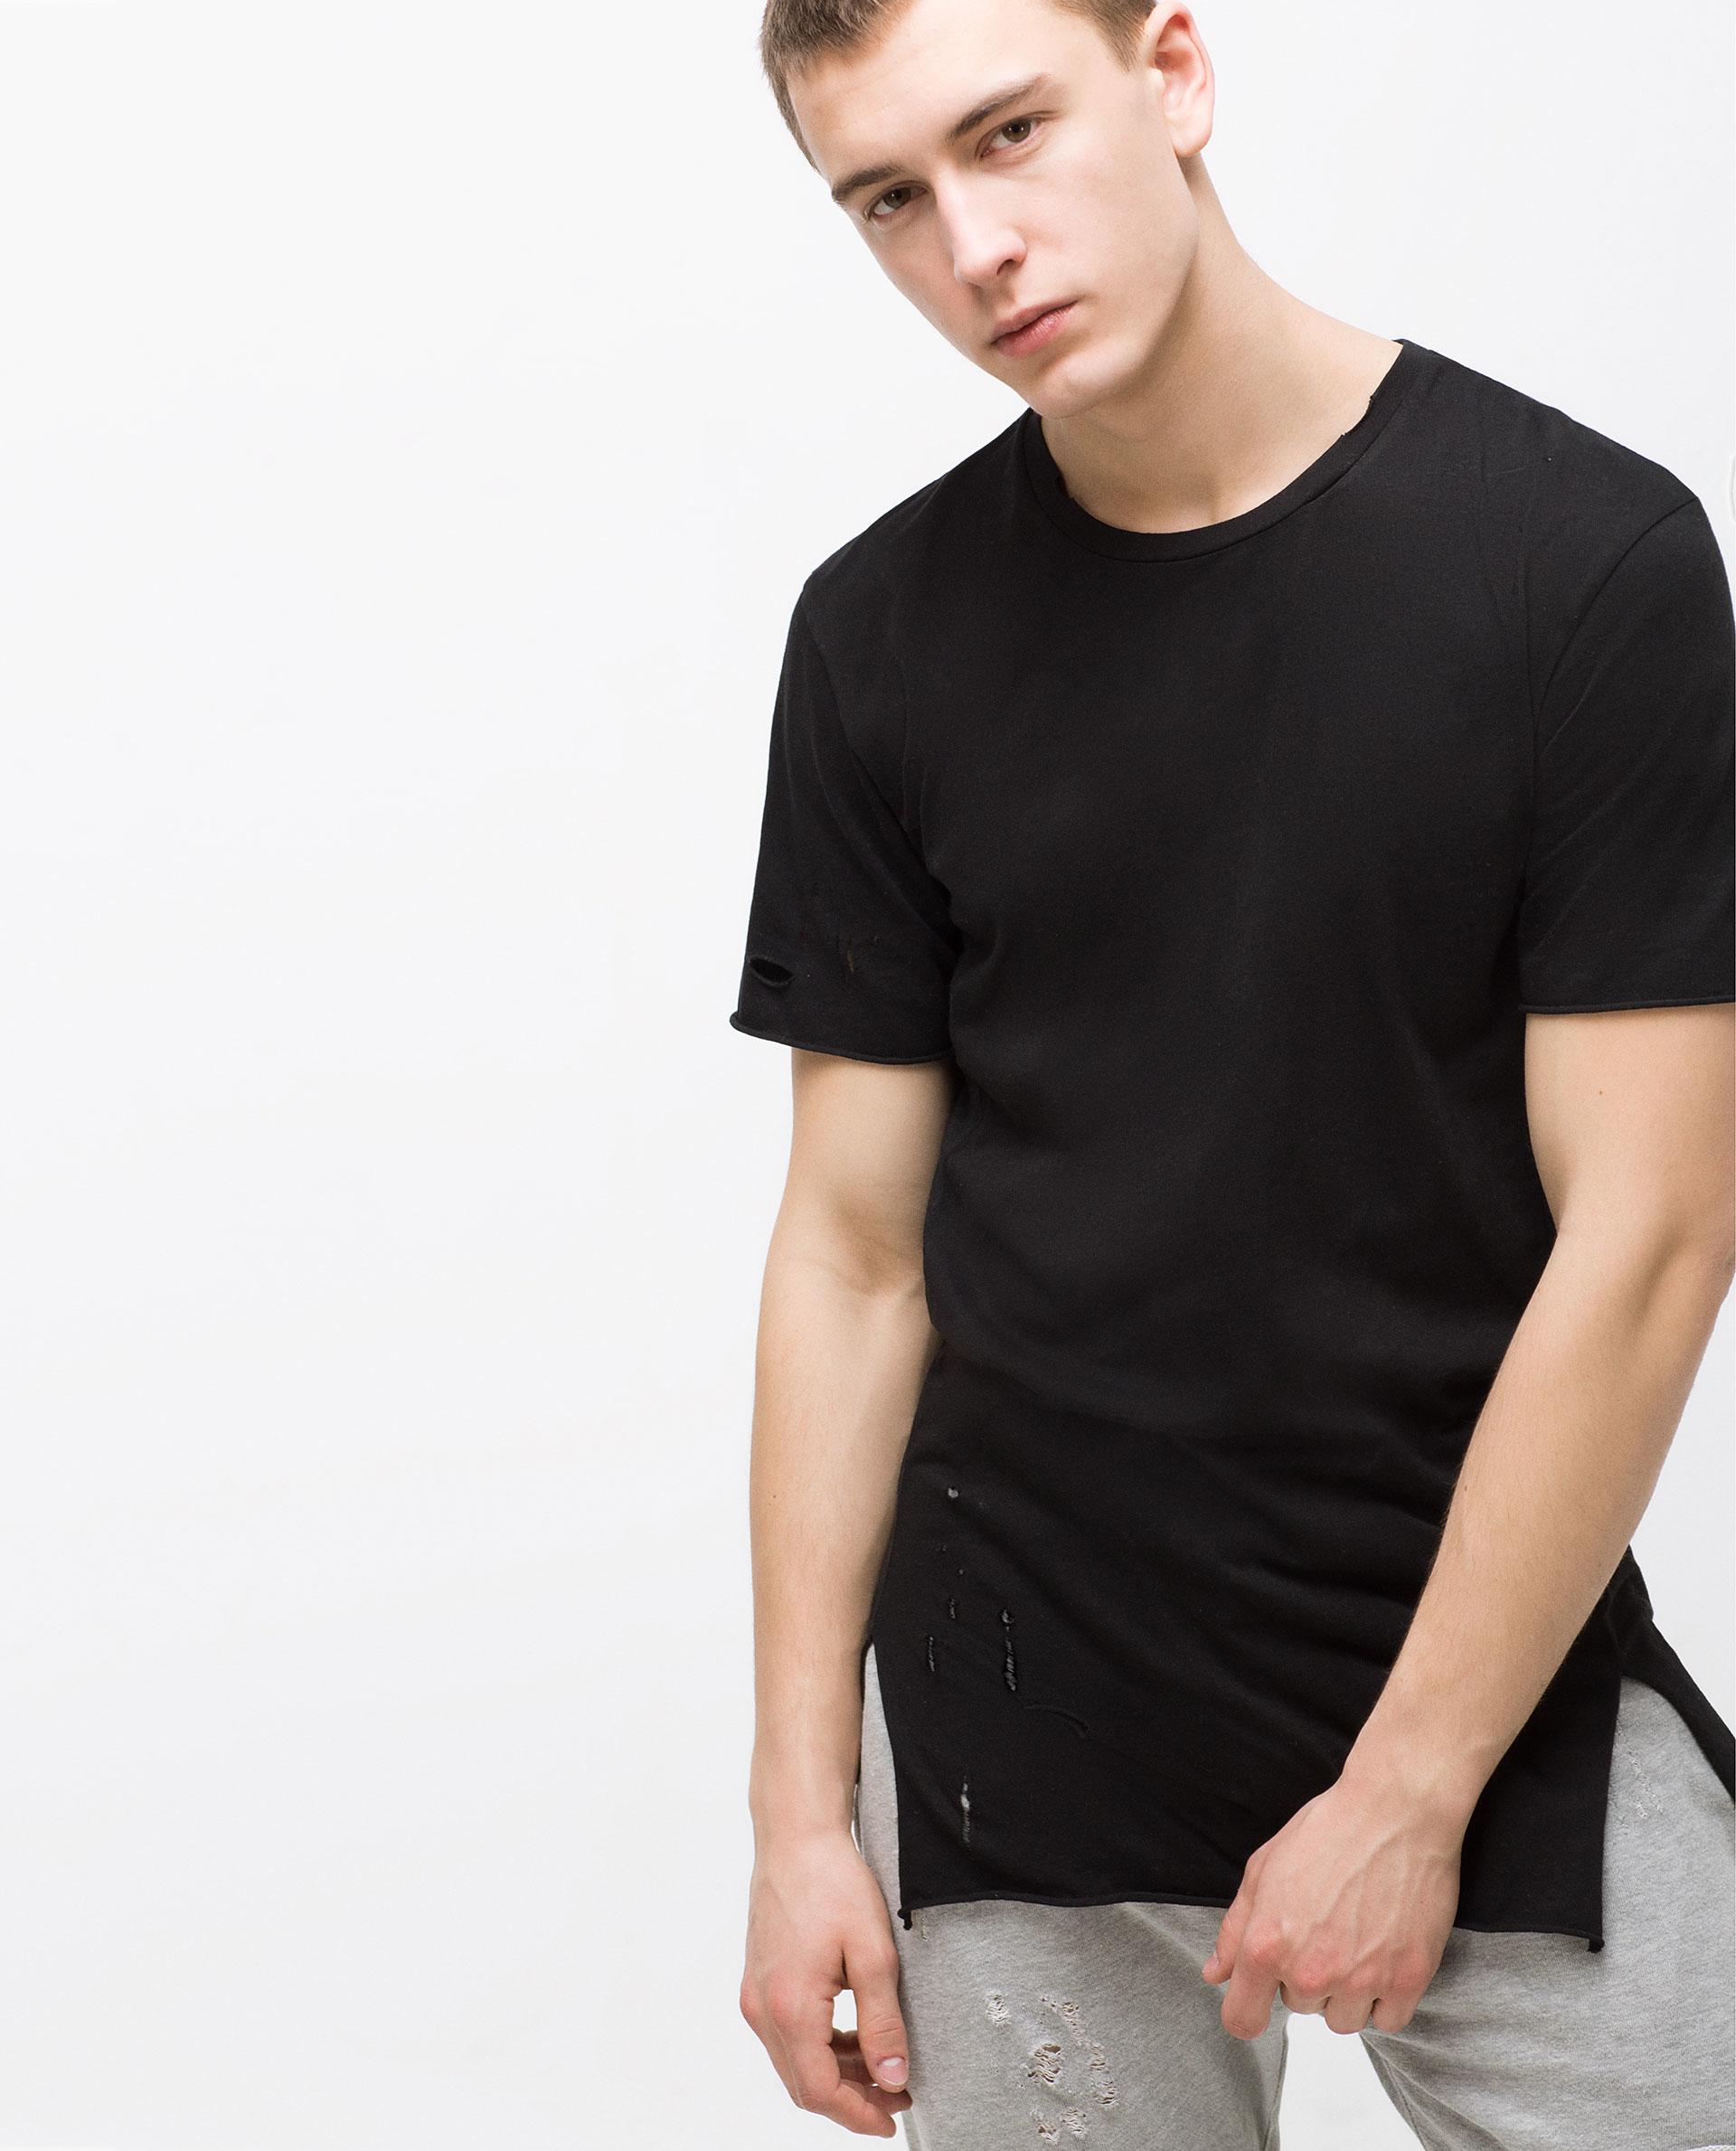 Black t shirt for man - Zara Black T Shirt Man Zara Ripped T Shirt In Black For Men Lyst